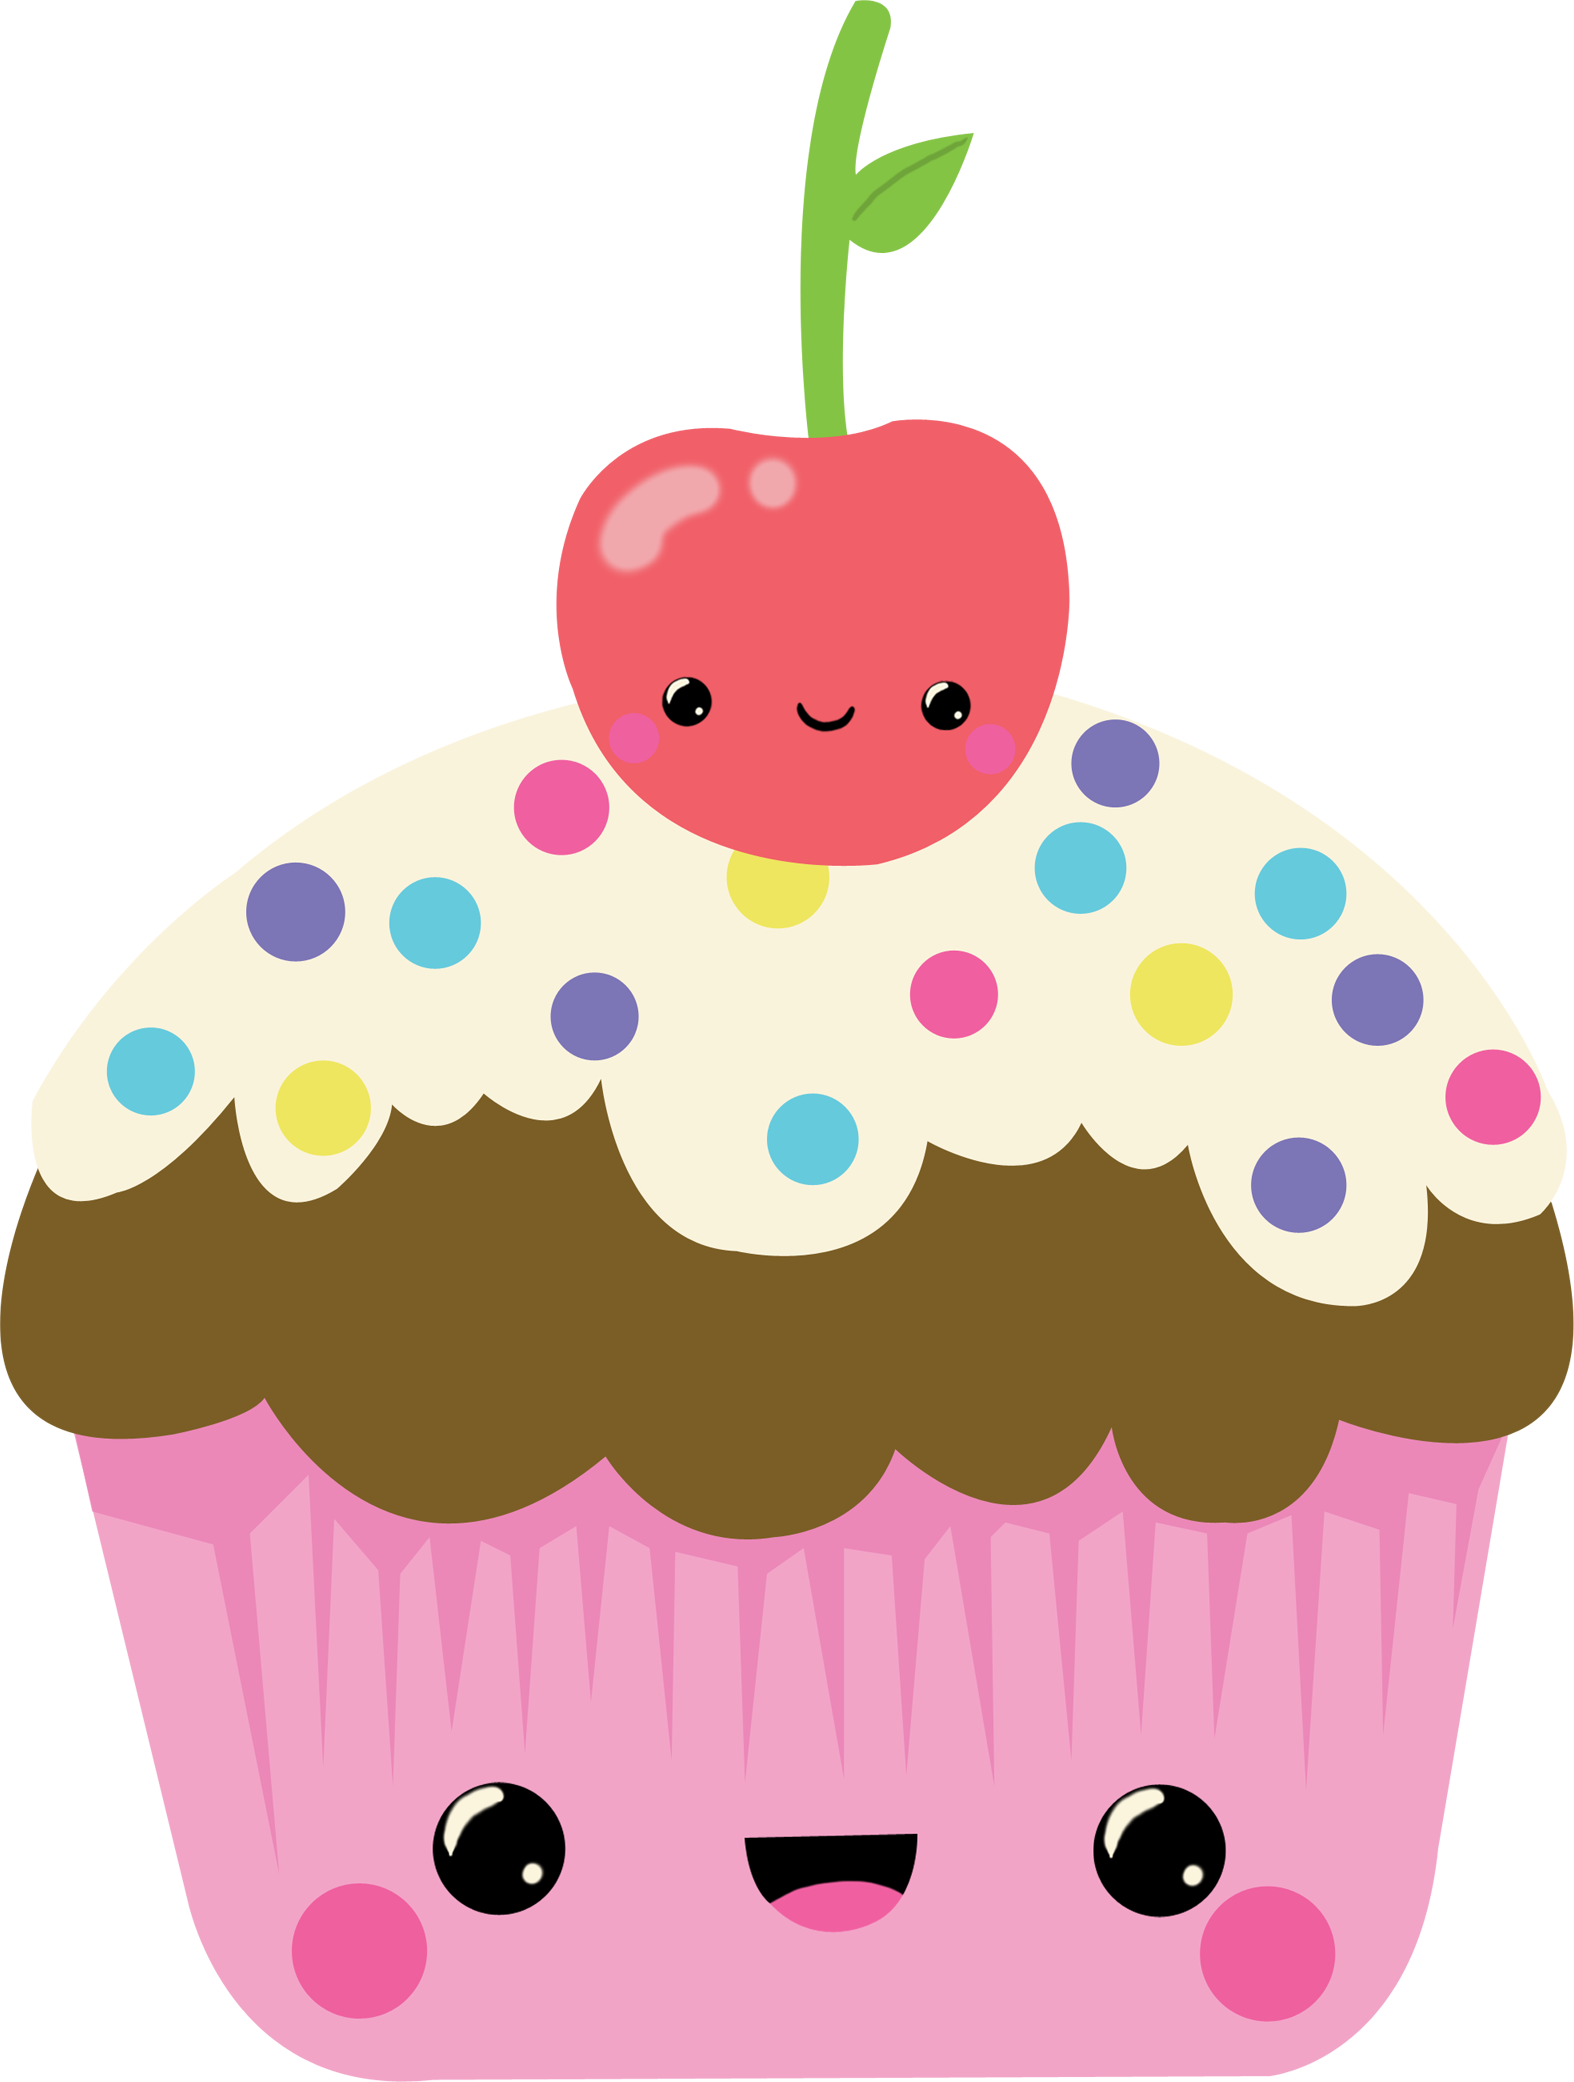 Muffins clipart little. Cartoon cupcakes x top